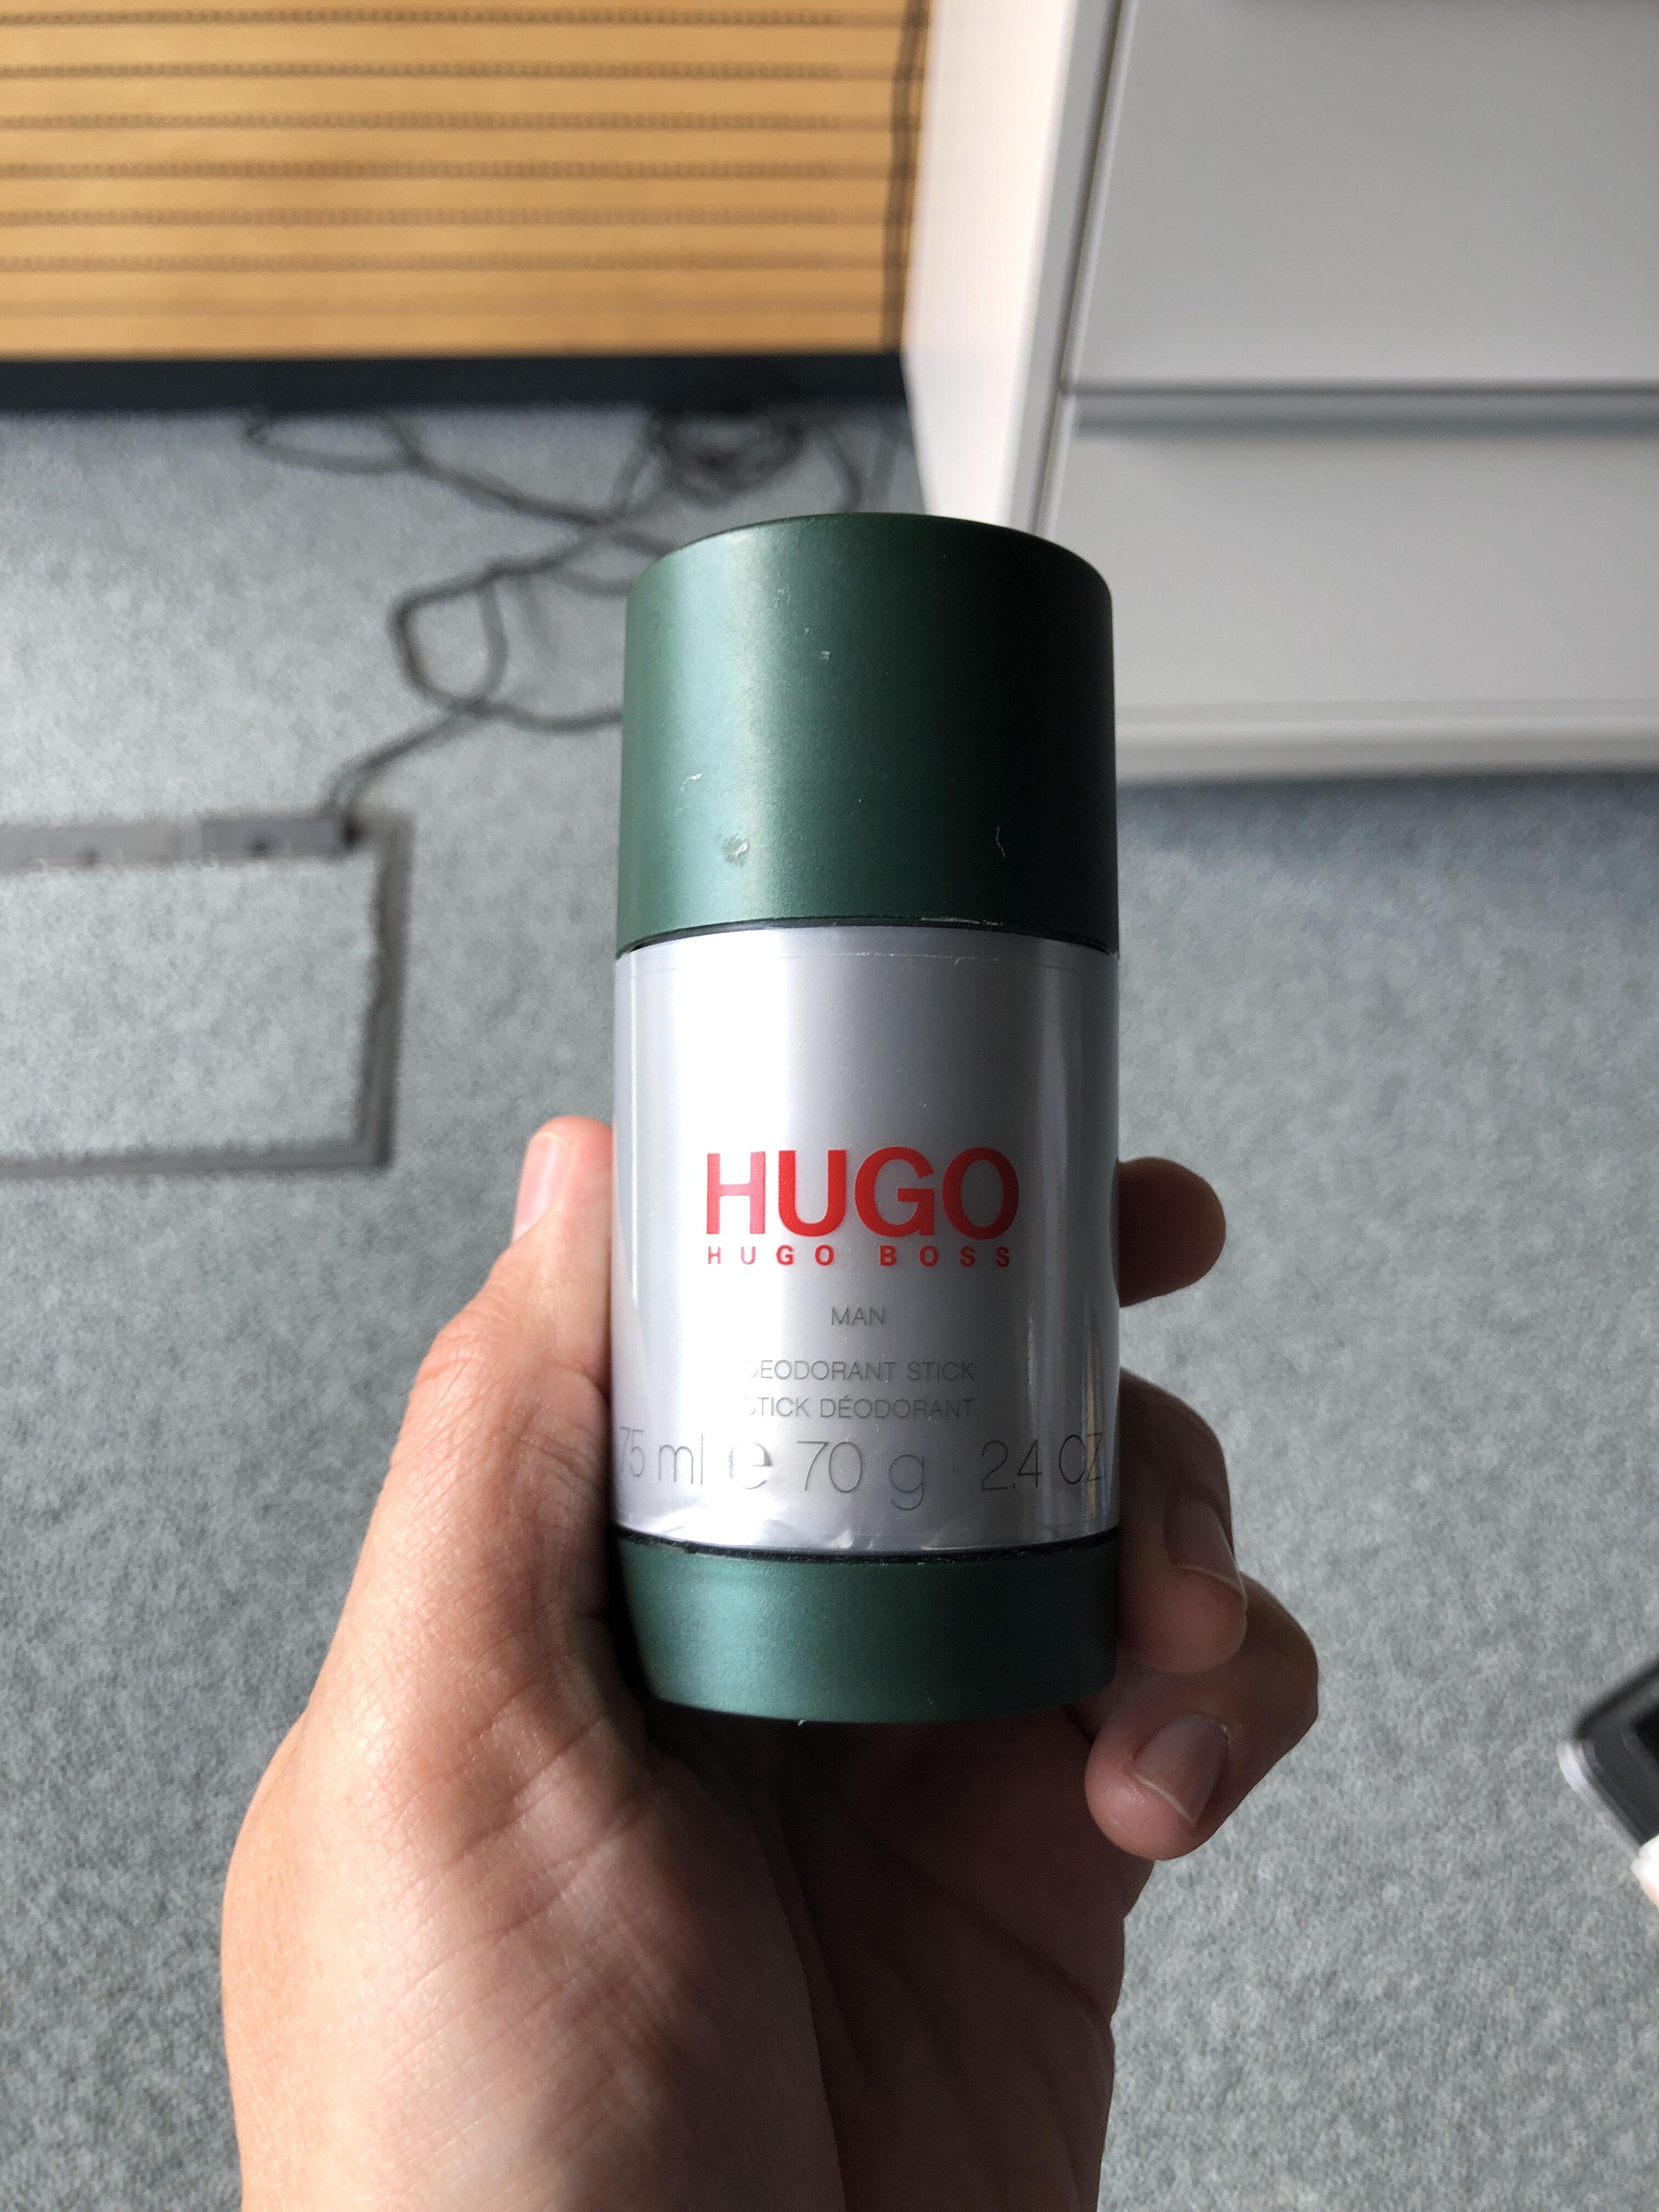 Deodorant Stick - Product - en